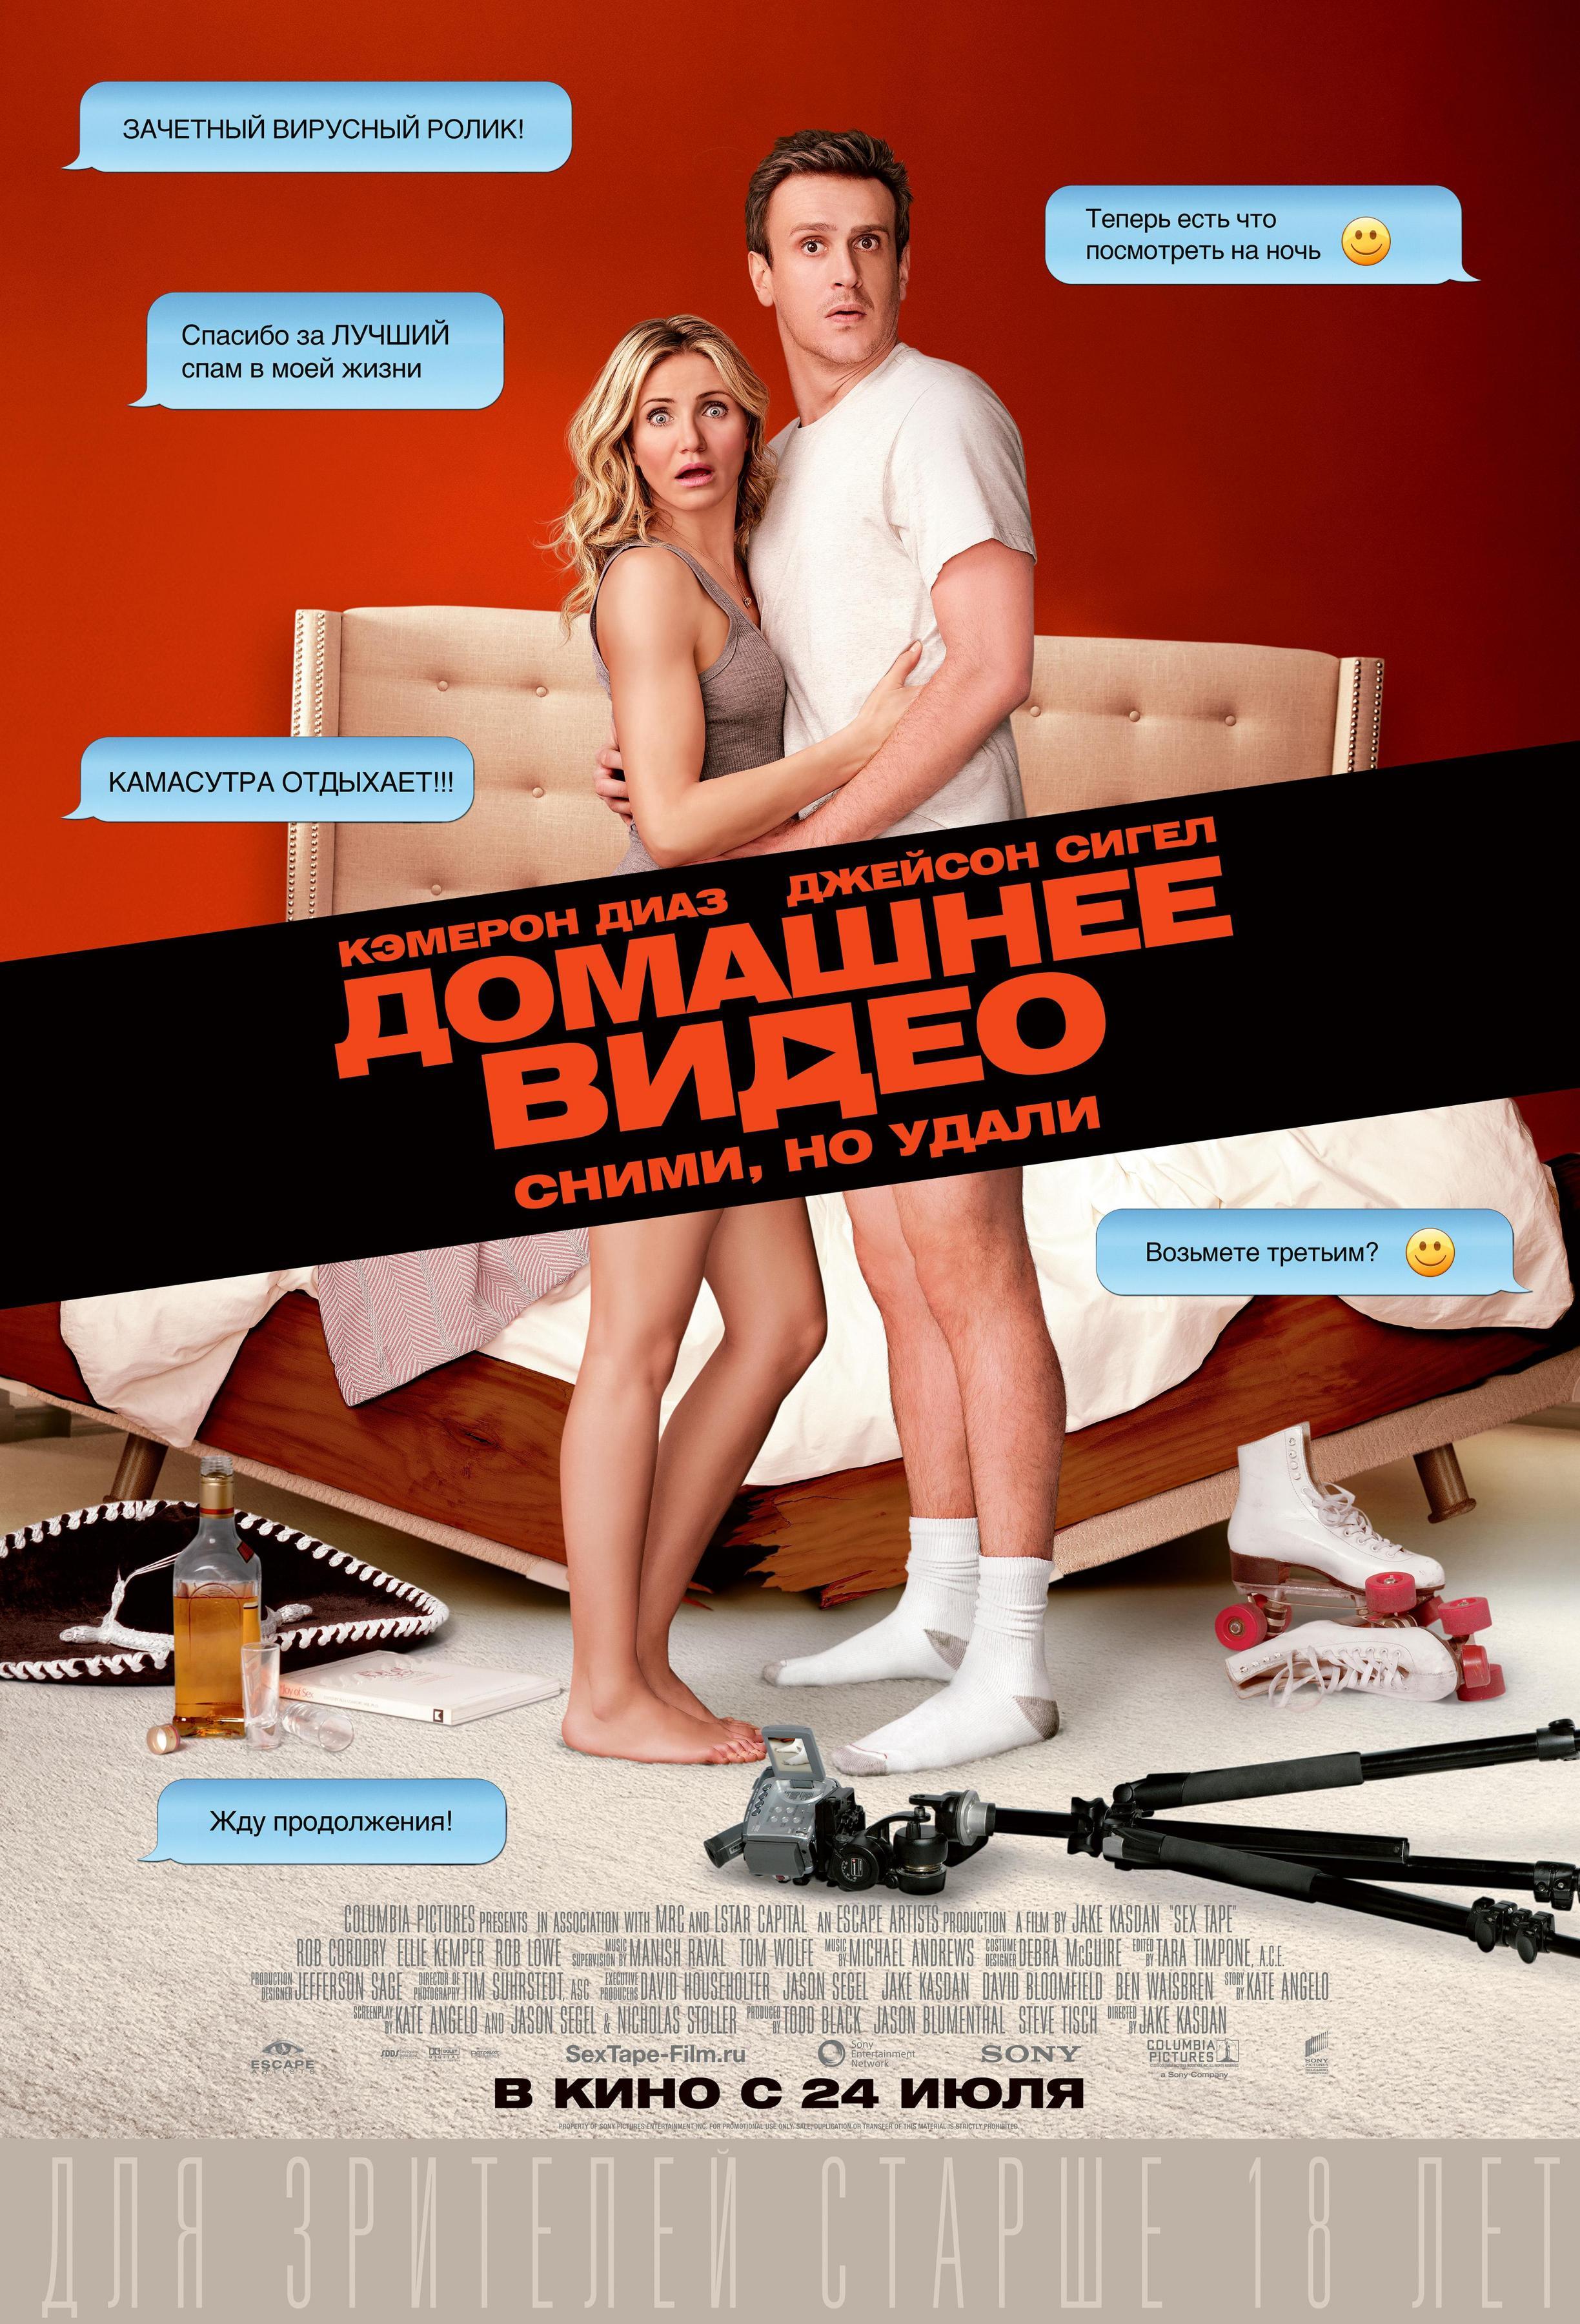 smotret-russkoe-domashnee-video